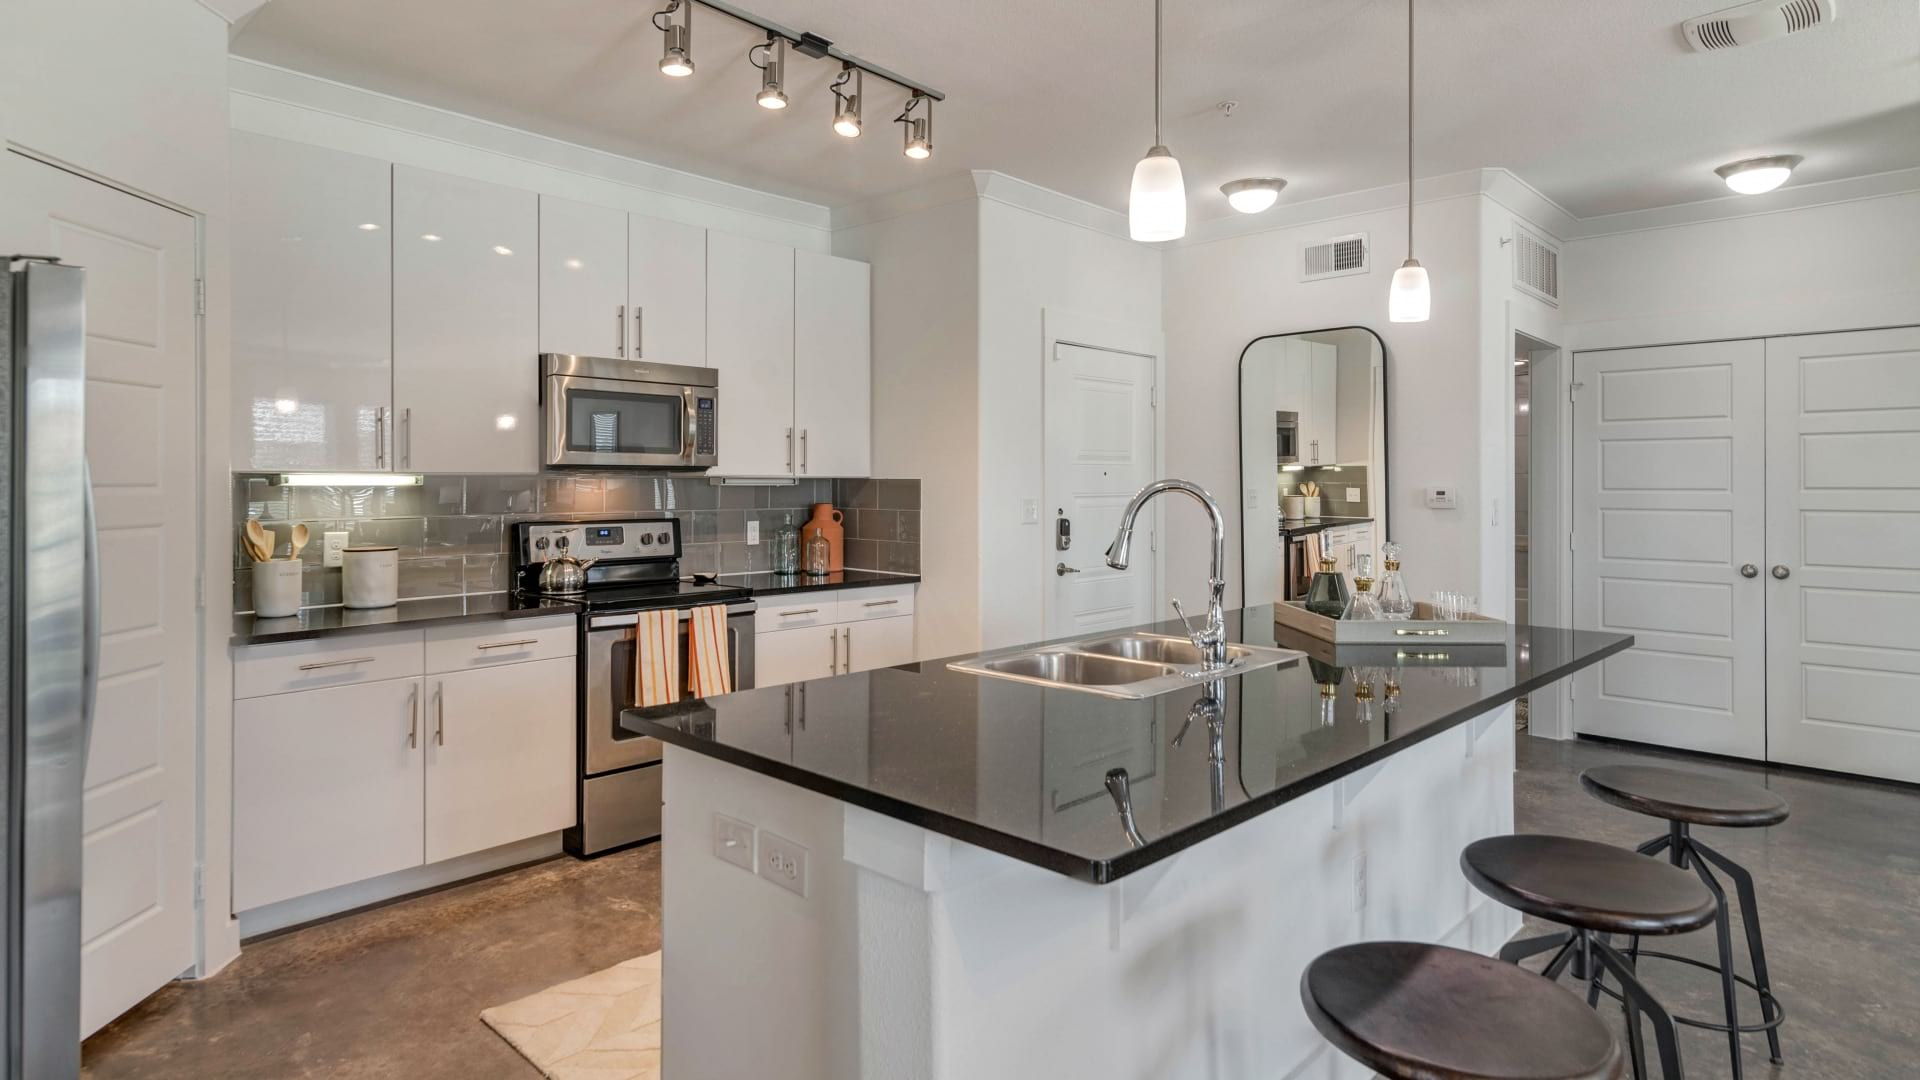 Spacious apartment kitchen with granite countertops